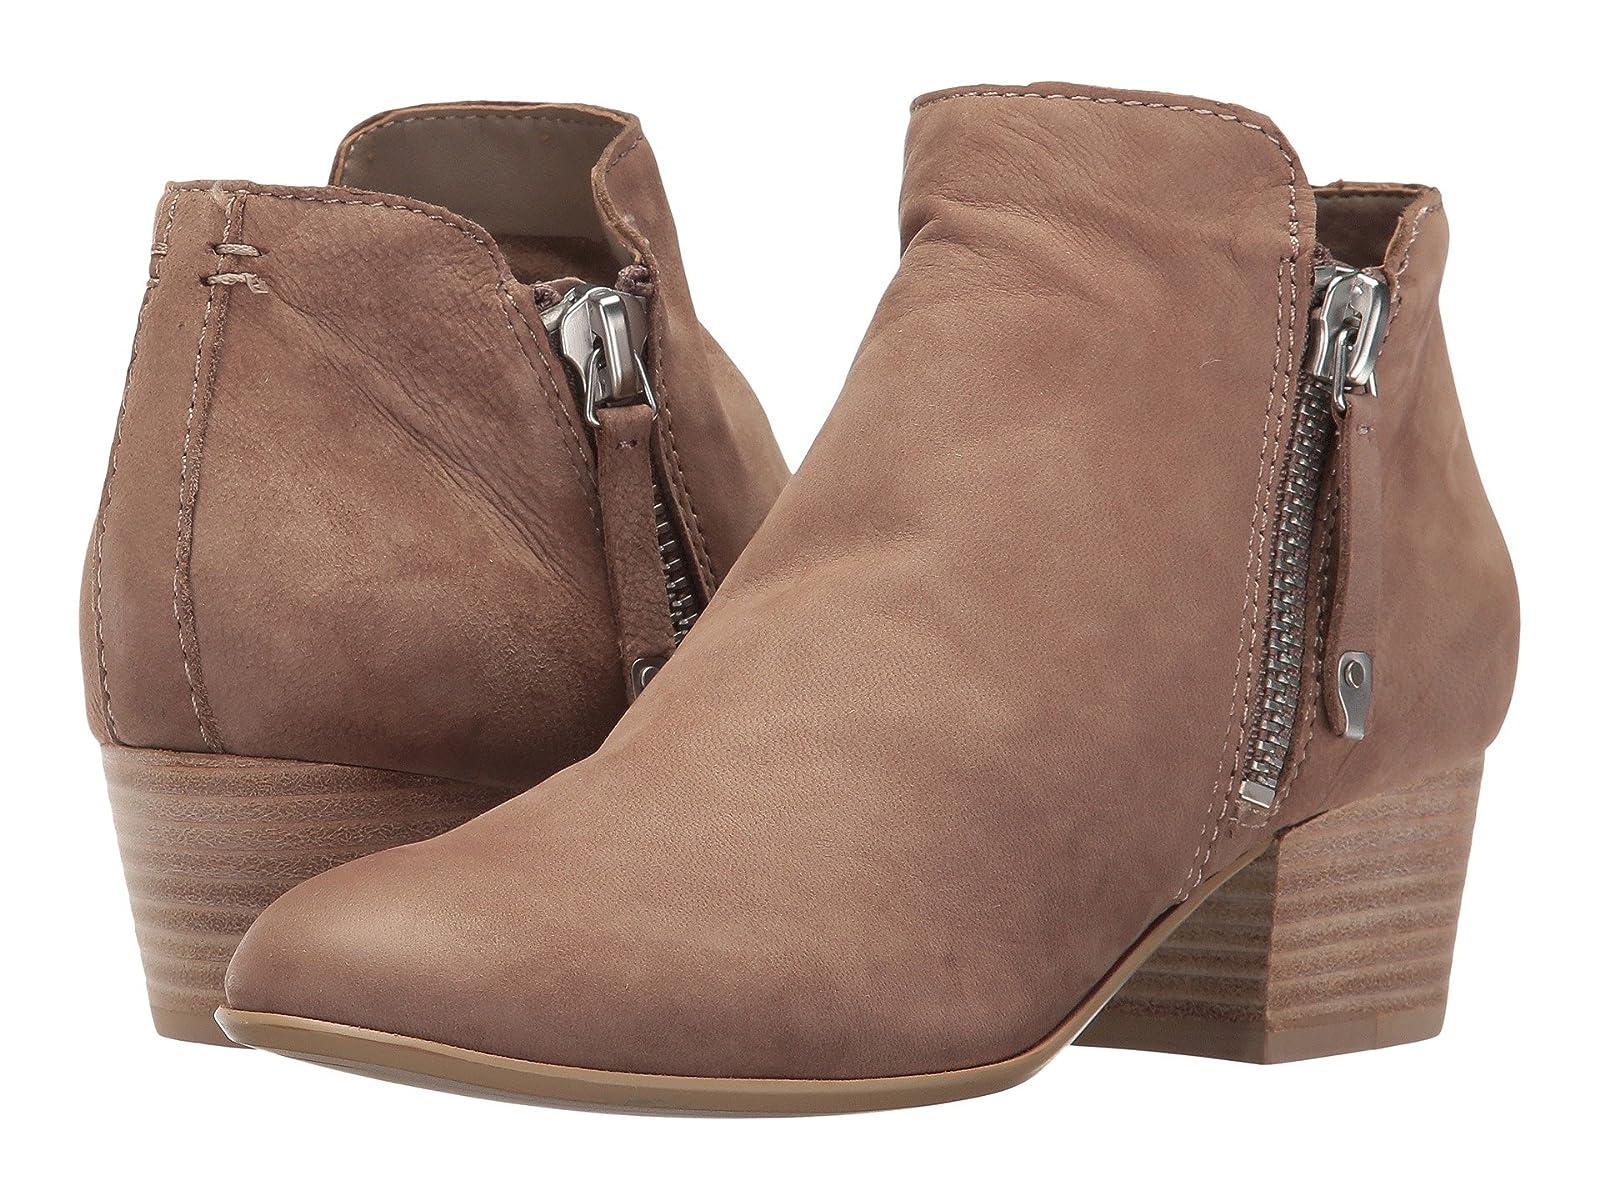 Dolce Vita GertieCheap and distinctive eye-catching shoes